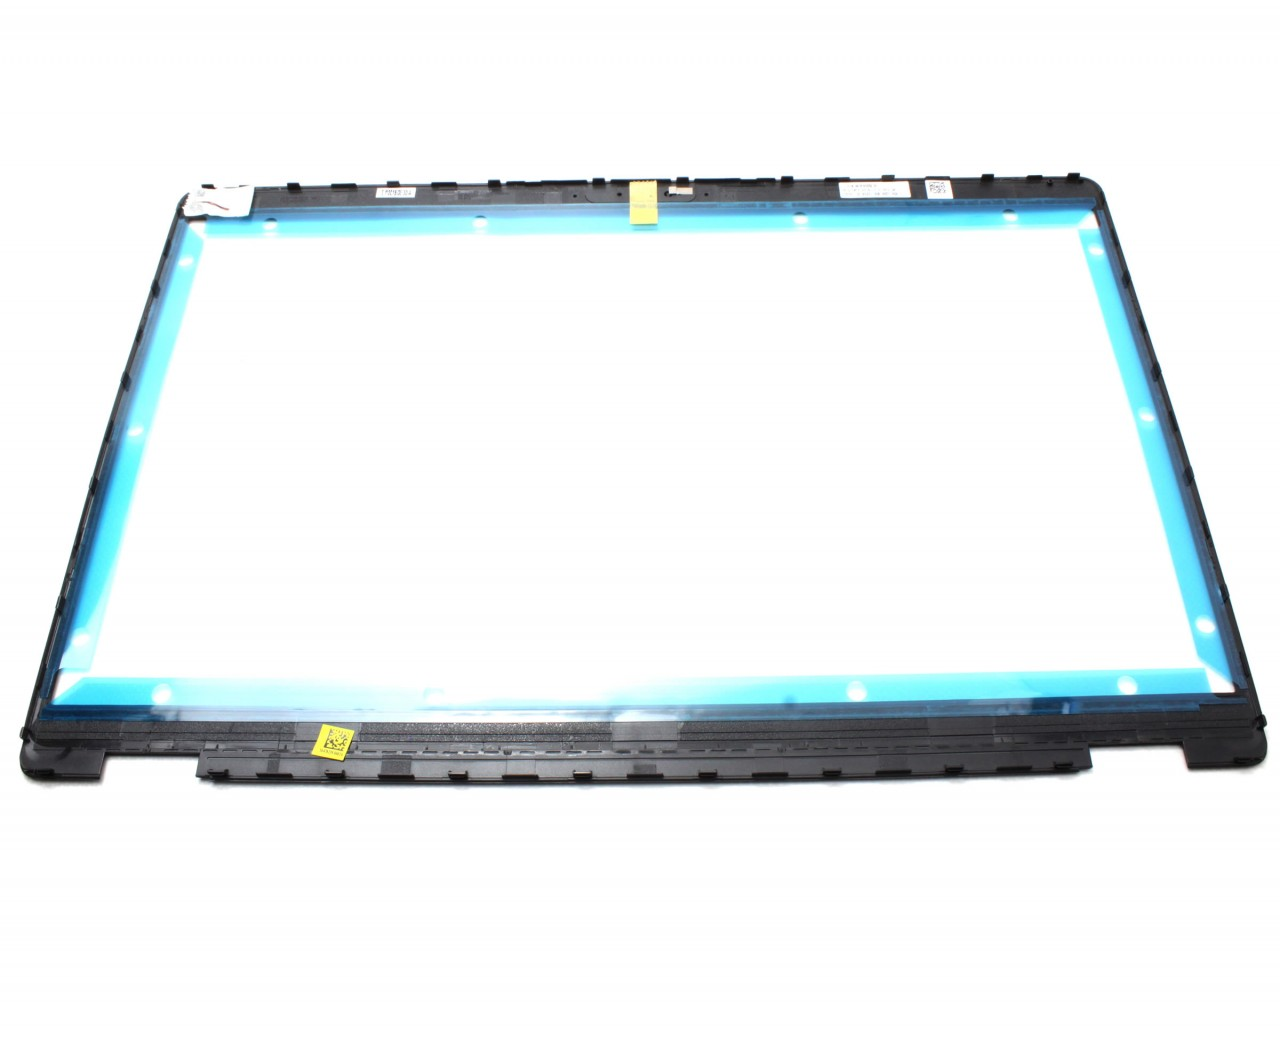 Rama Display Dell Latitude E3540 Bezel Front Cover Neagra imagine powerlaptop.ro 2021